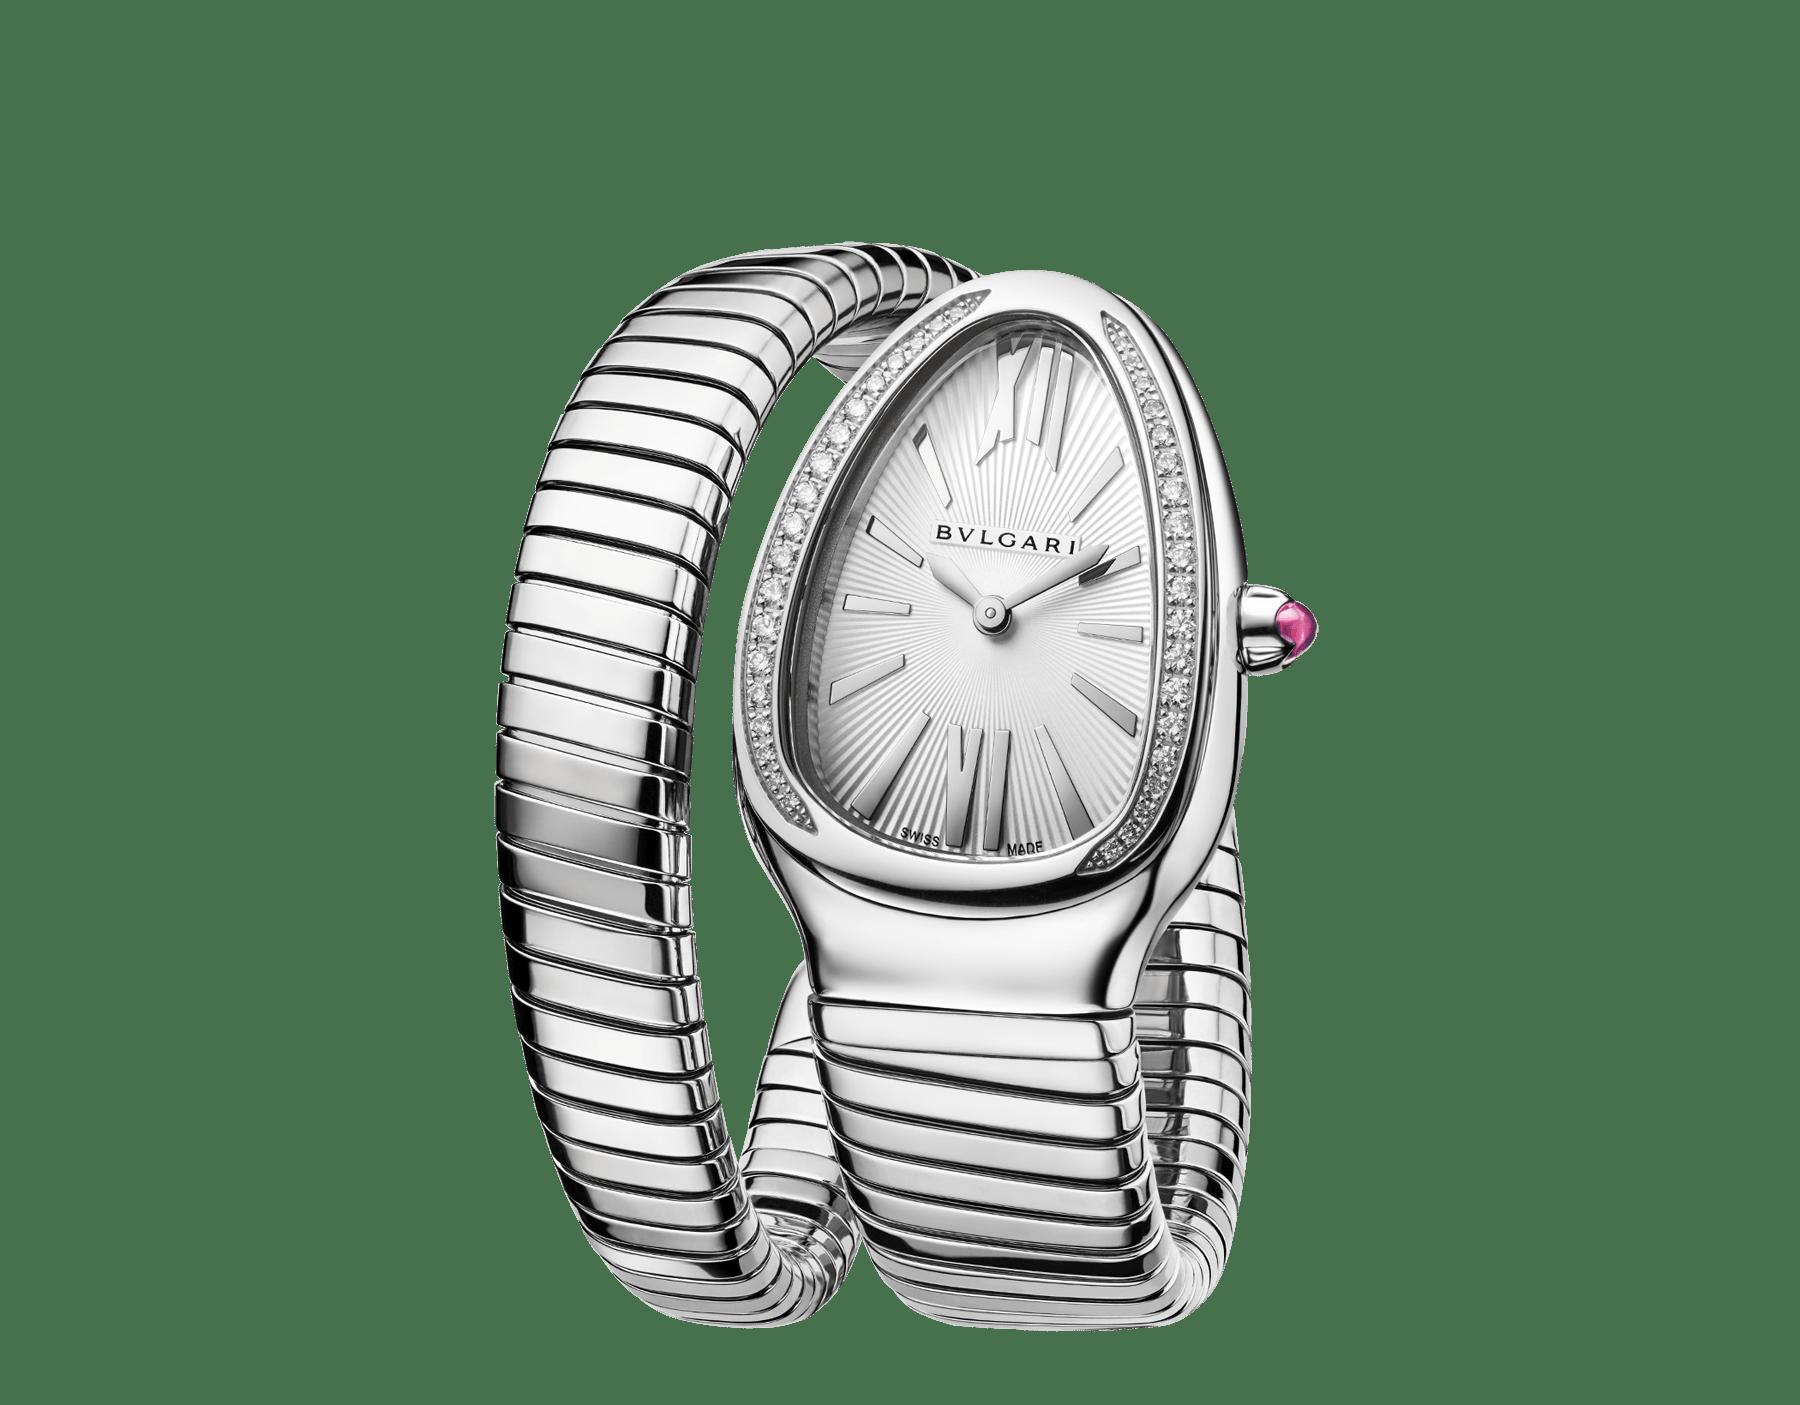 Reloj Serpenti Tubogas con caja y brazalete de una vuelta en acero inoxidable con esfera plateada opalescente. Talla grande. SrpntTubogas-white-dial1 image 2